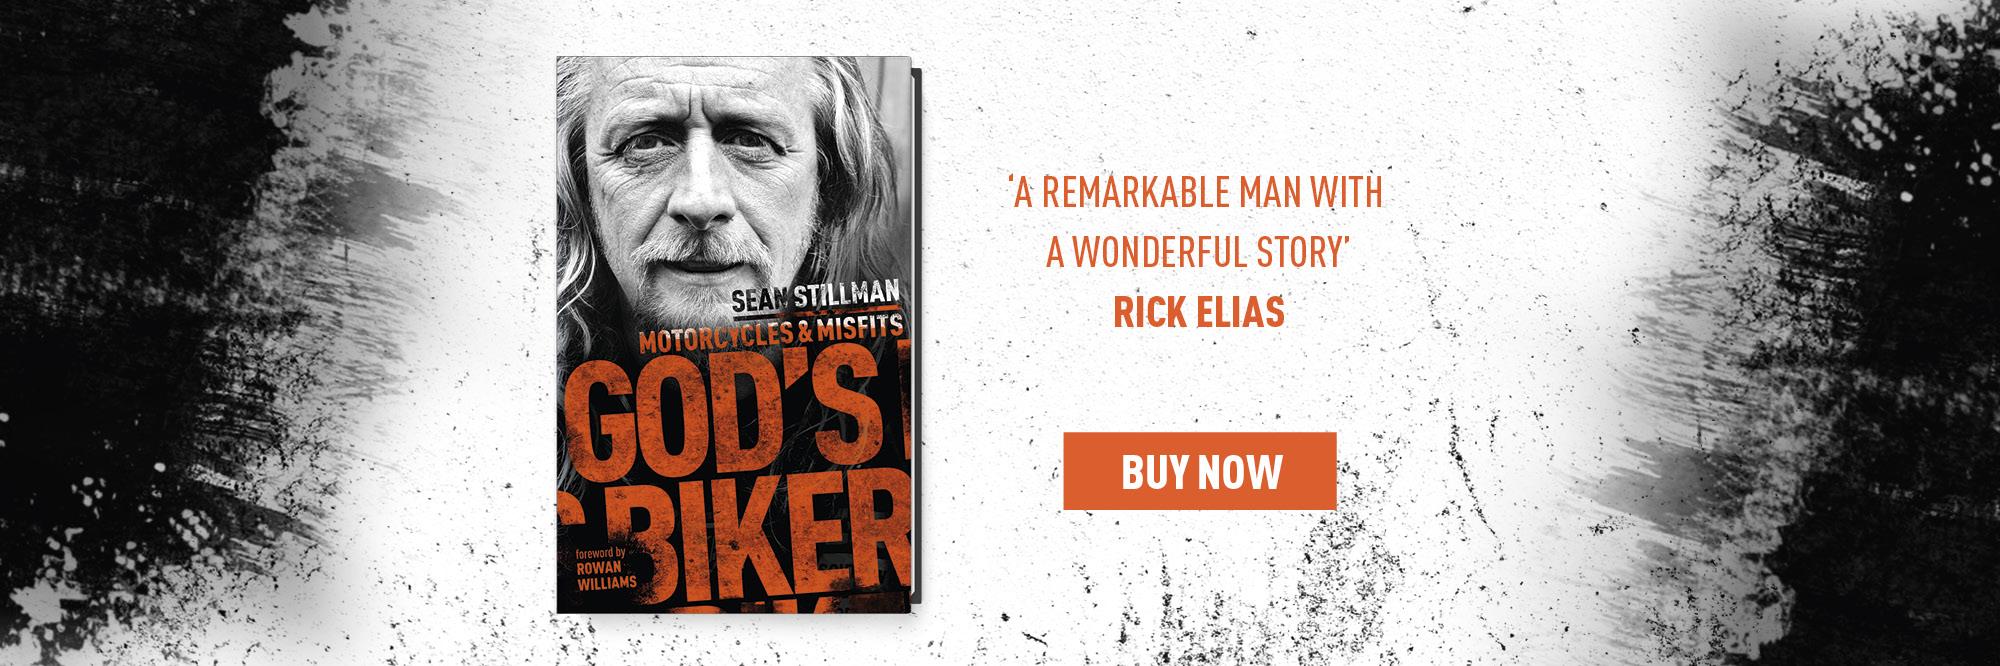 God's Biker by Sean Stillman